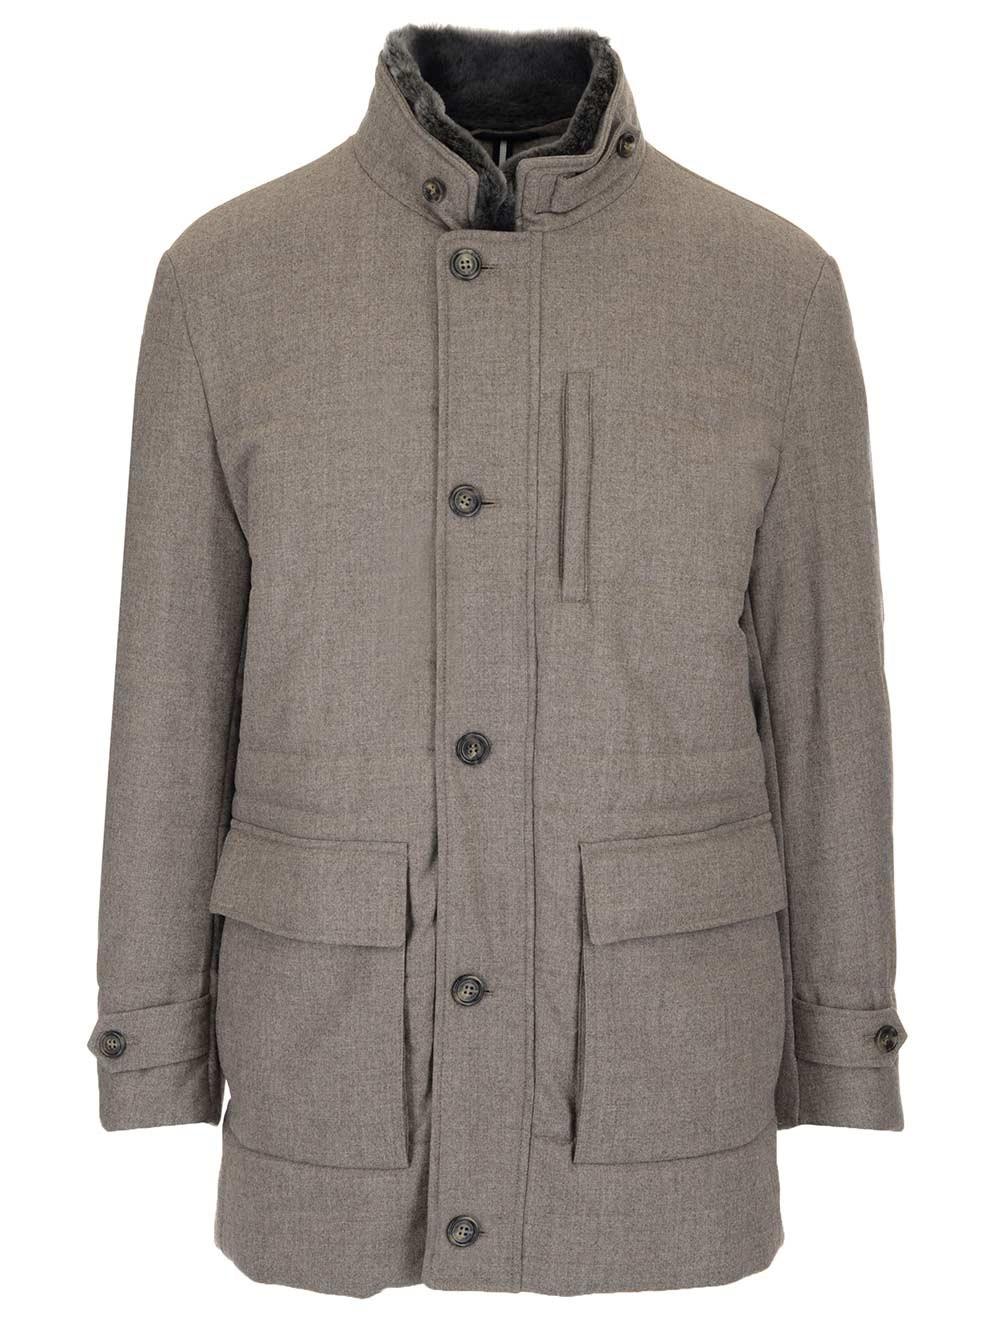 SCHNEIDERS Taupe Brown Wool Jacket